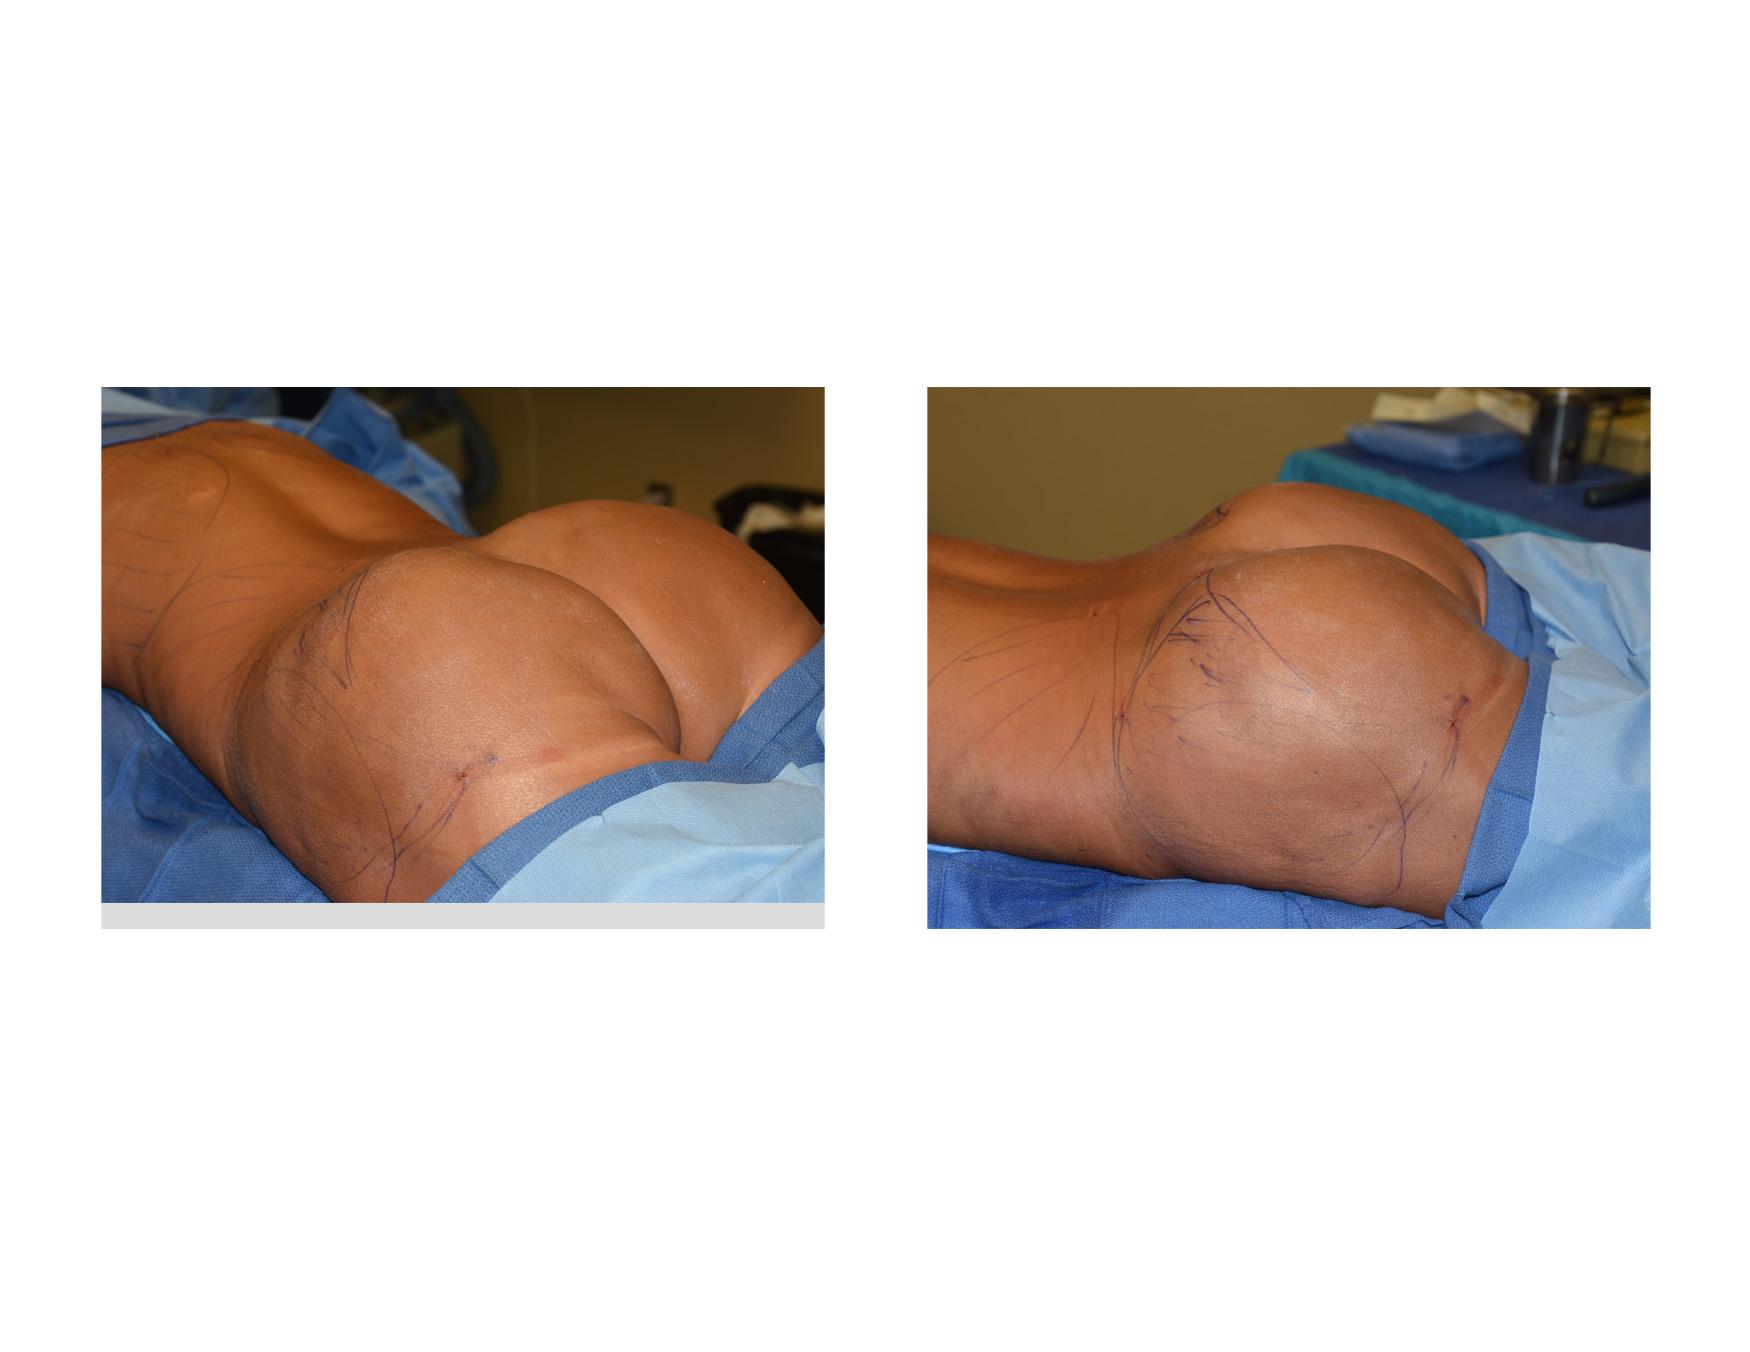 Implant Butt 49